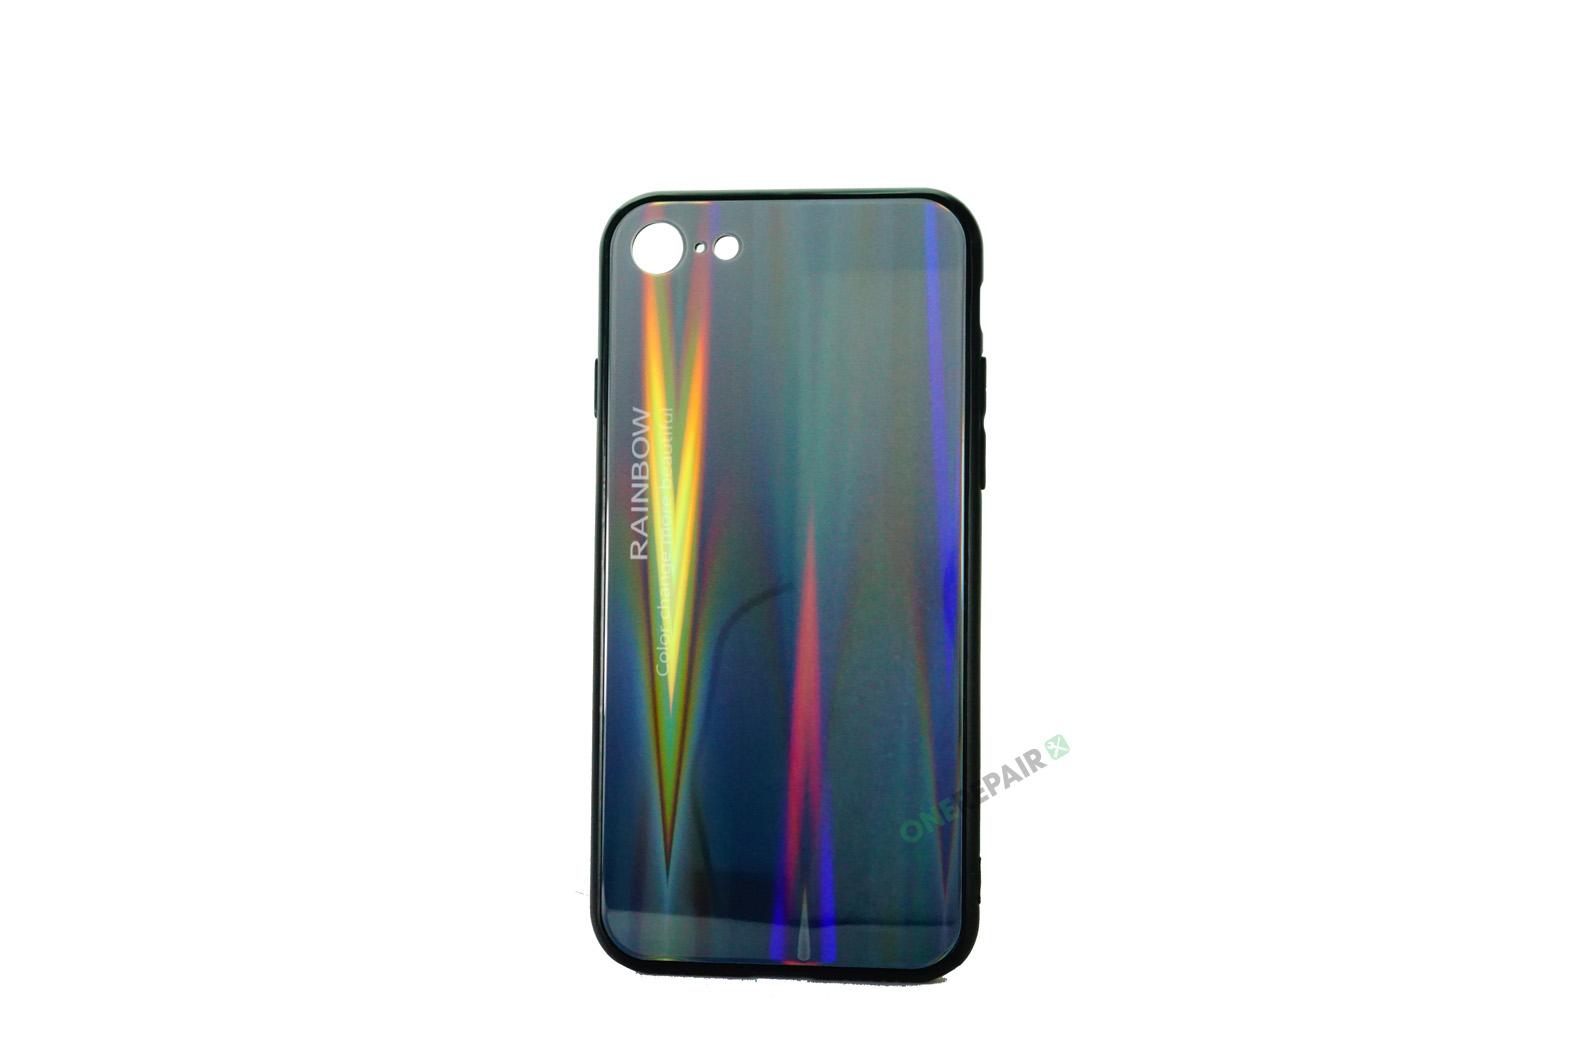 353615-001_iPhone_7_8_cover_rainbow_Graa_OneRepair_00001